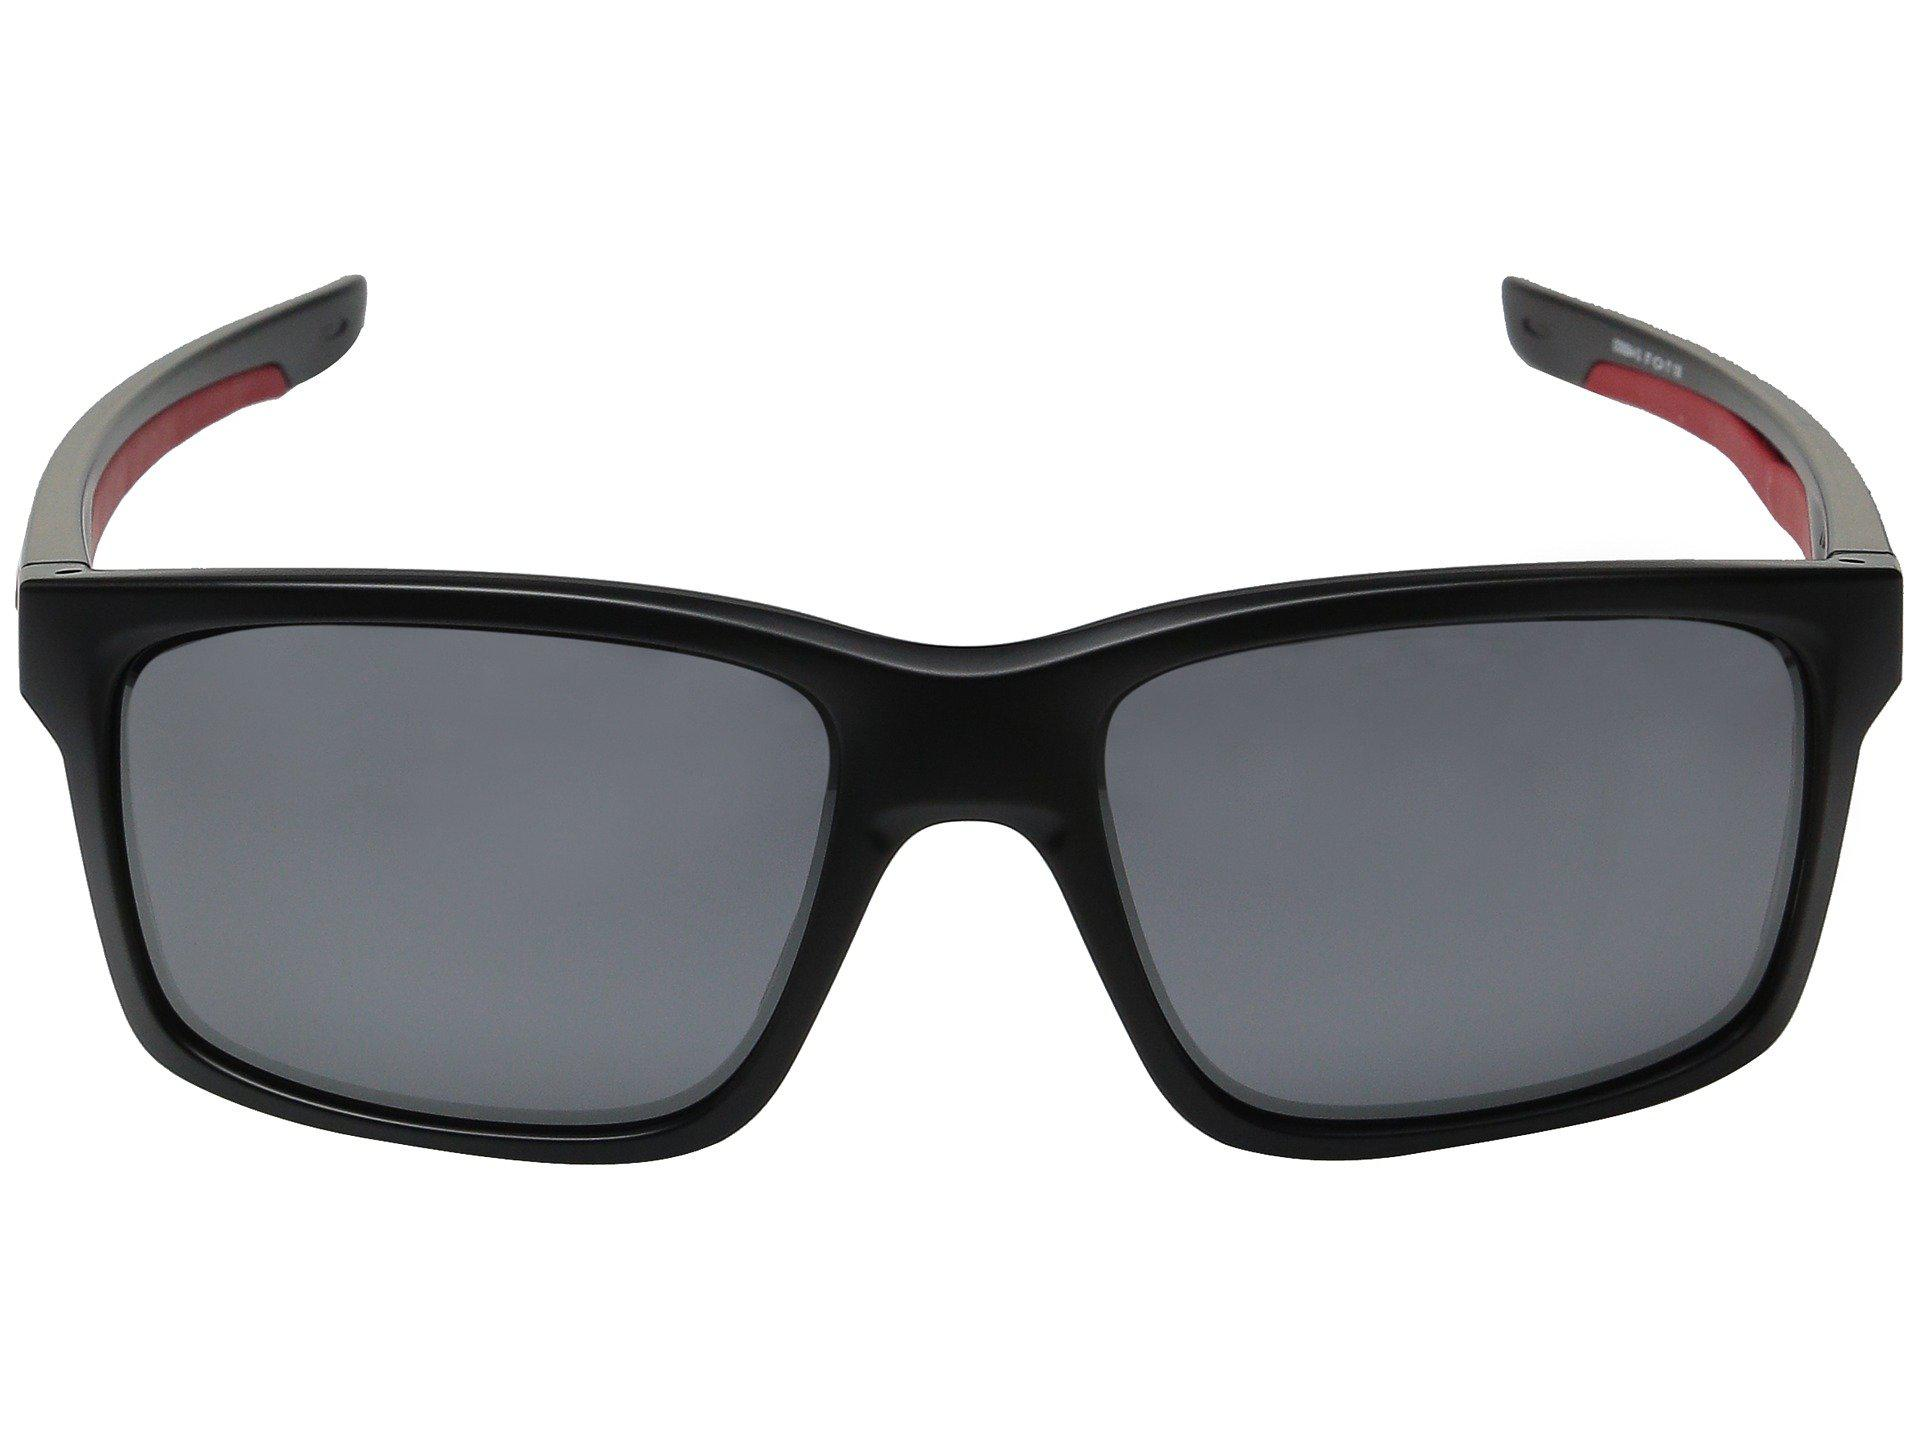 dc17b5e4d5 Oakley - Mainlink (matte Black black Iridium Polarized) Plastic Frame  Fashion Sunglasses for. View fullscreen